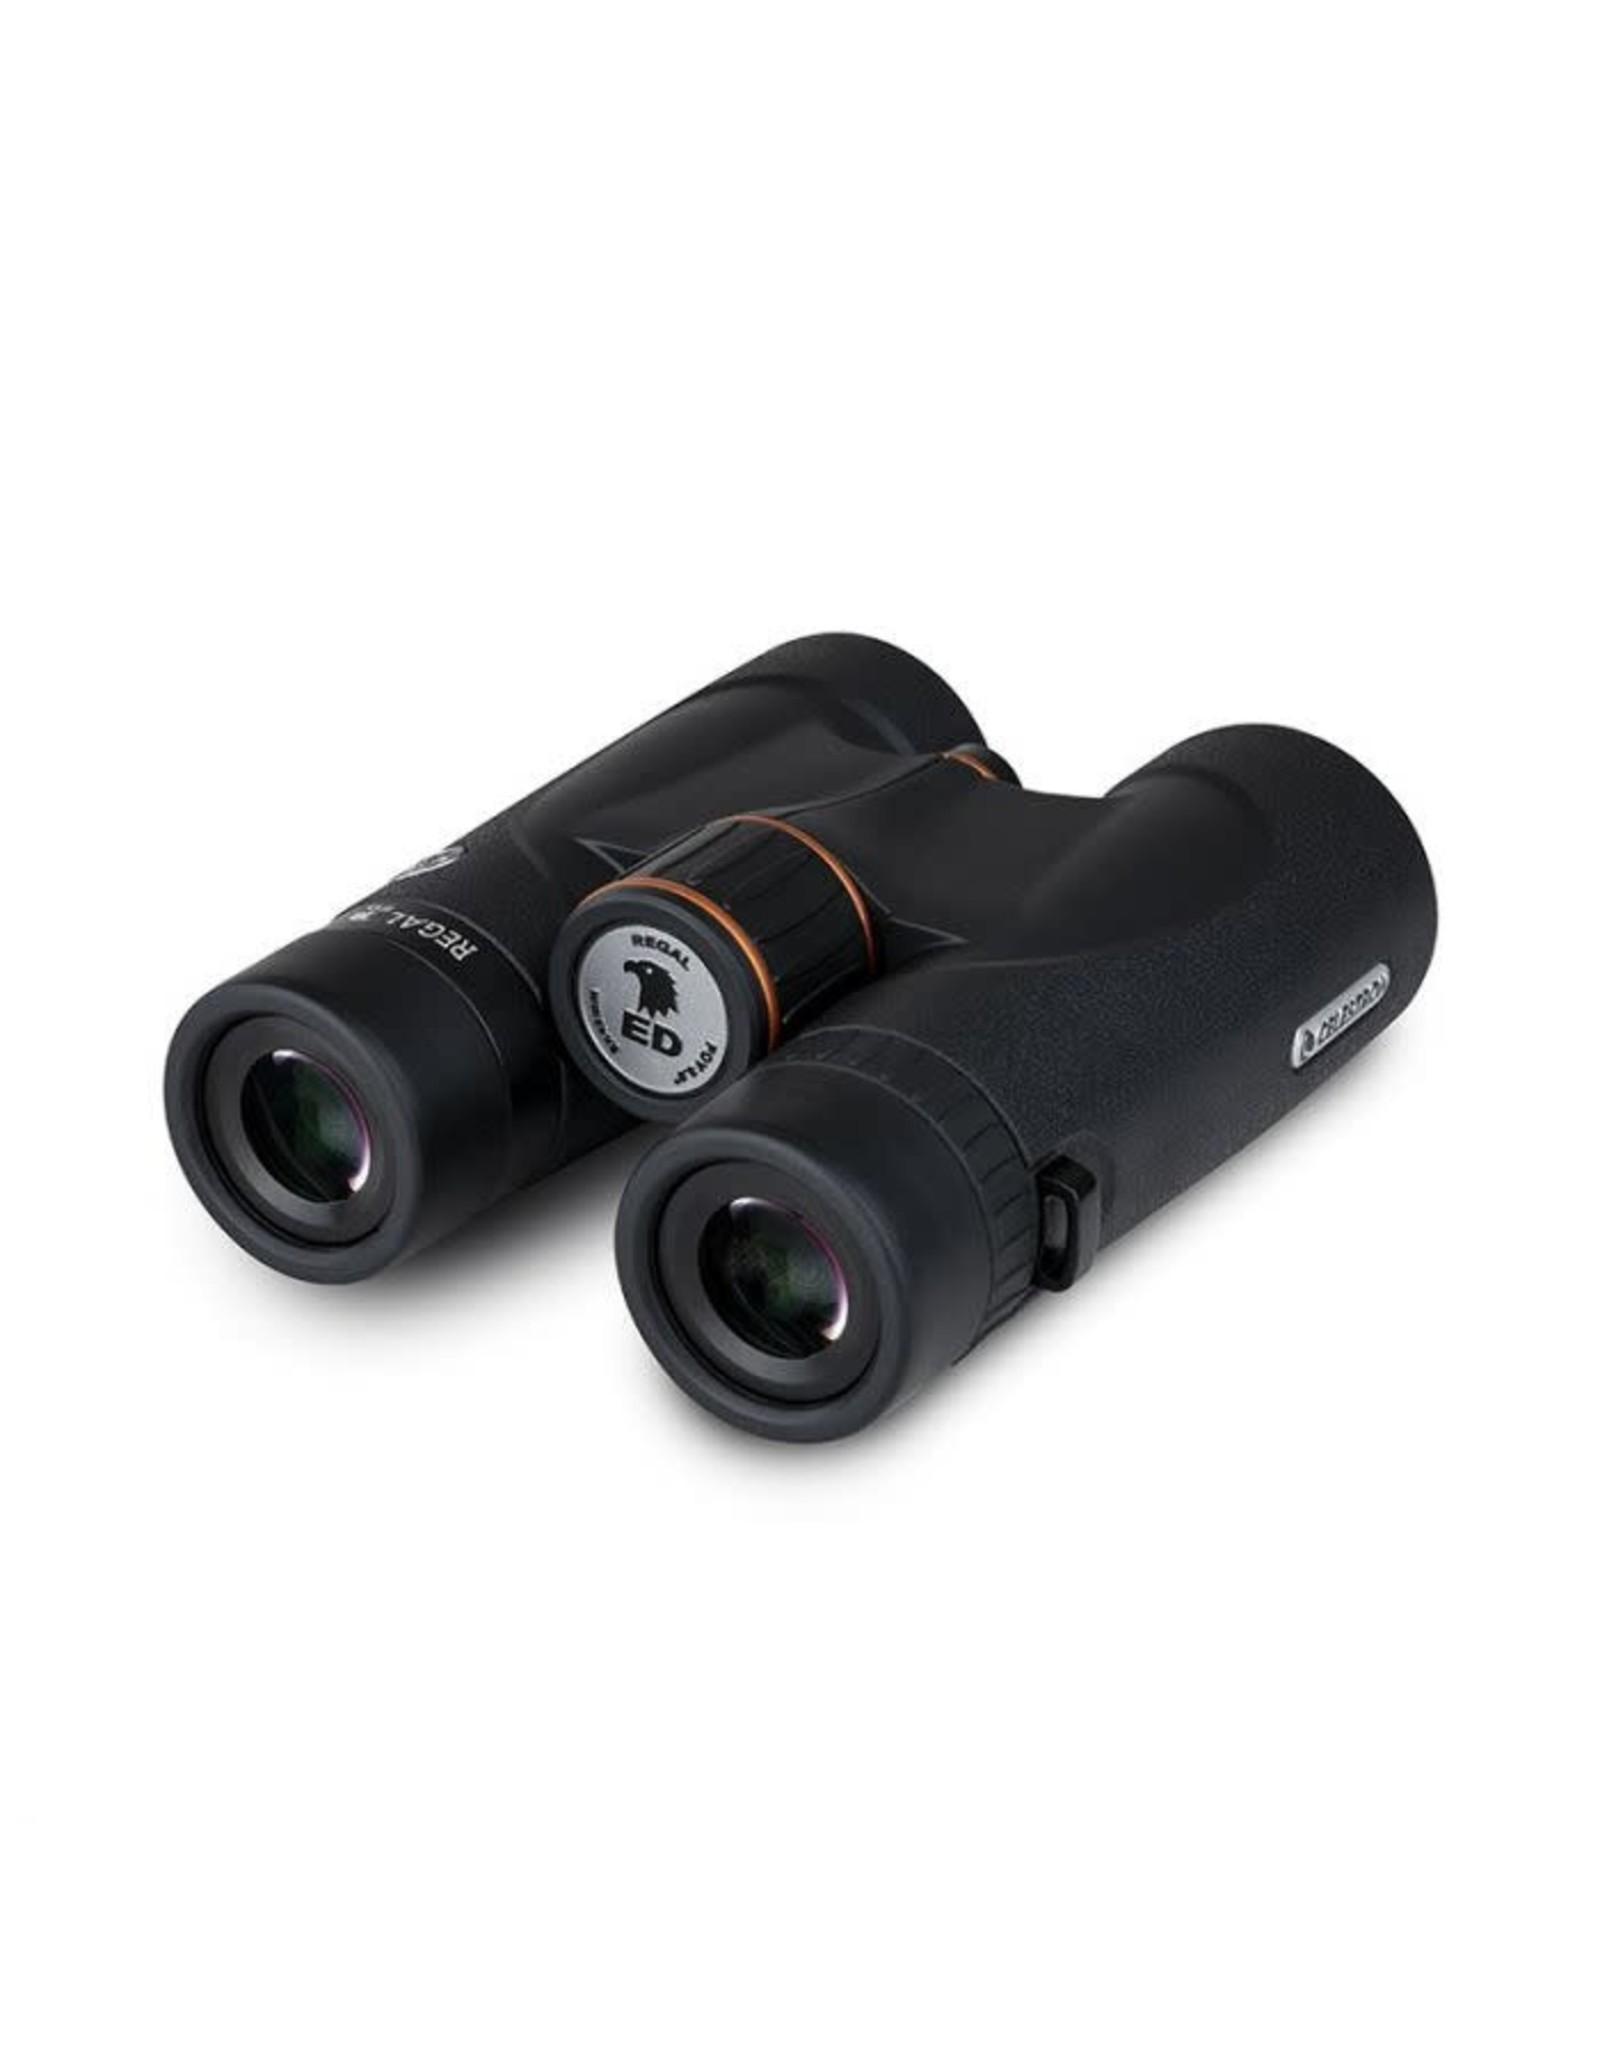 Celestron Celestron 10x42 Regal ED Roof Prism Binoculars - 71391